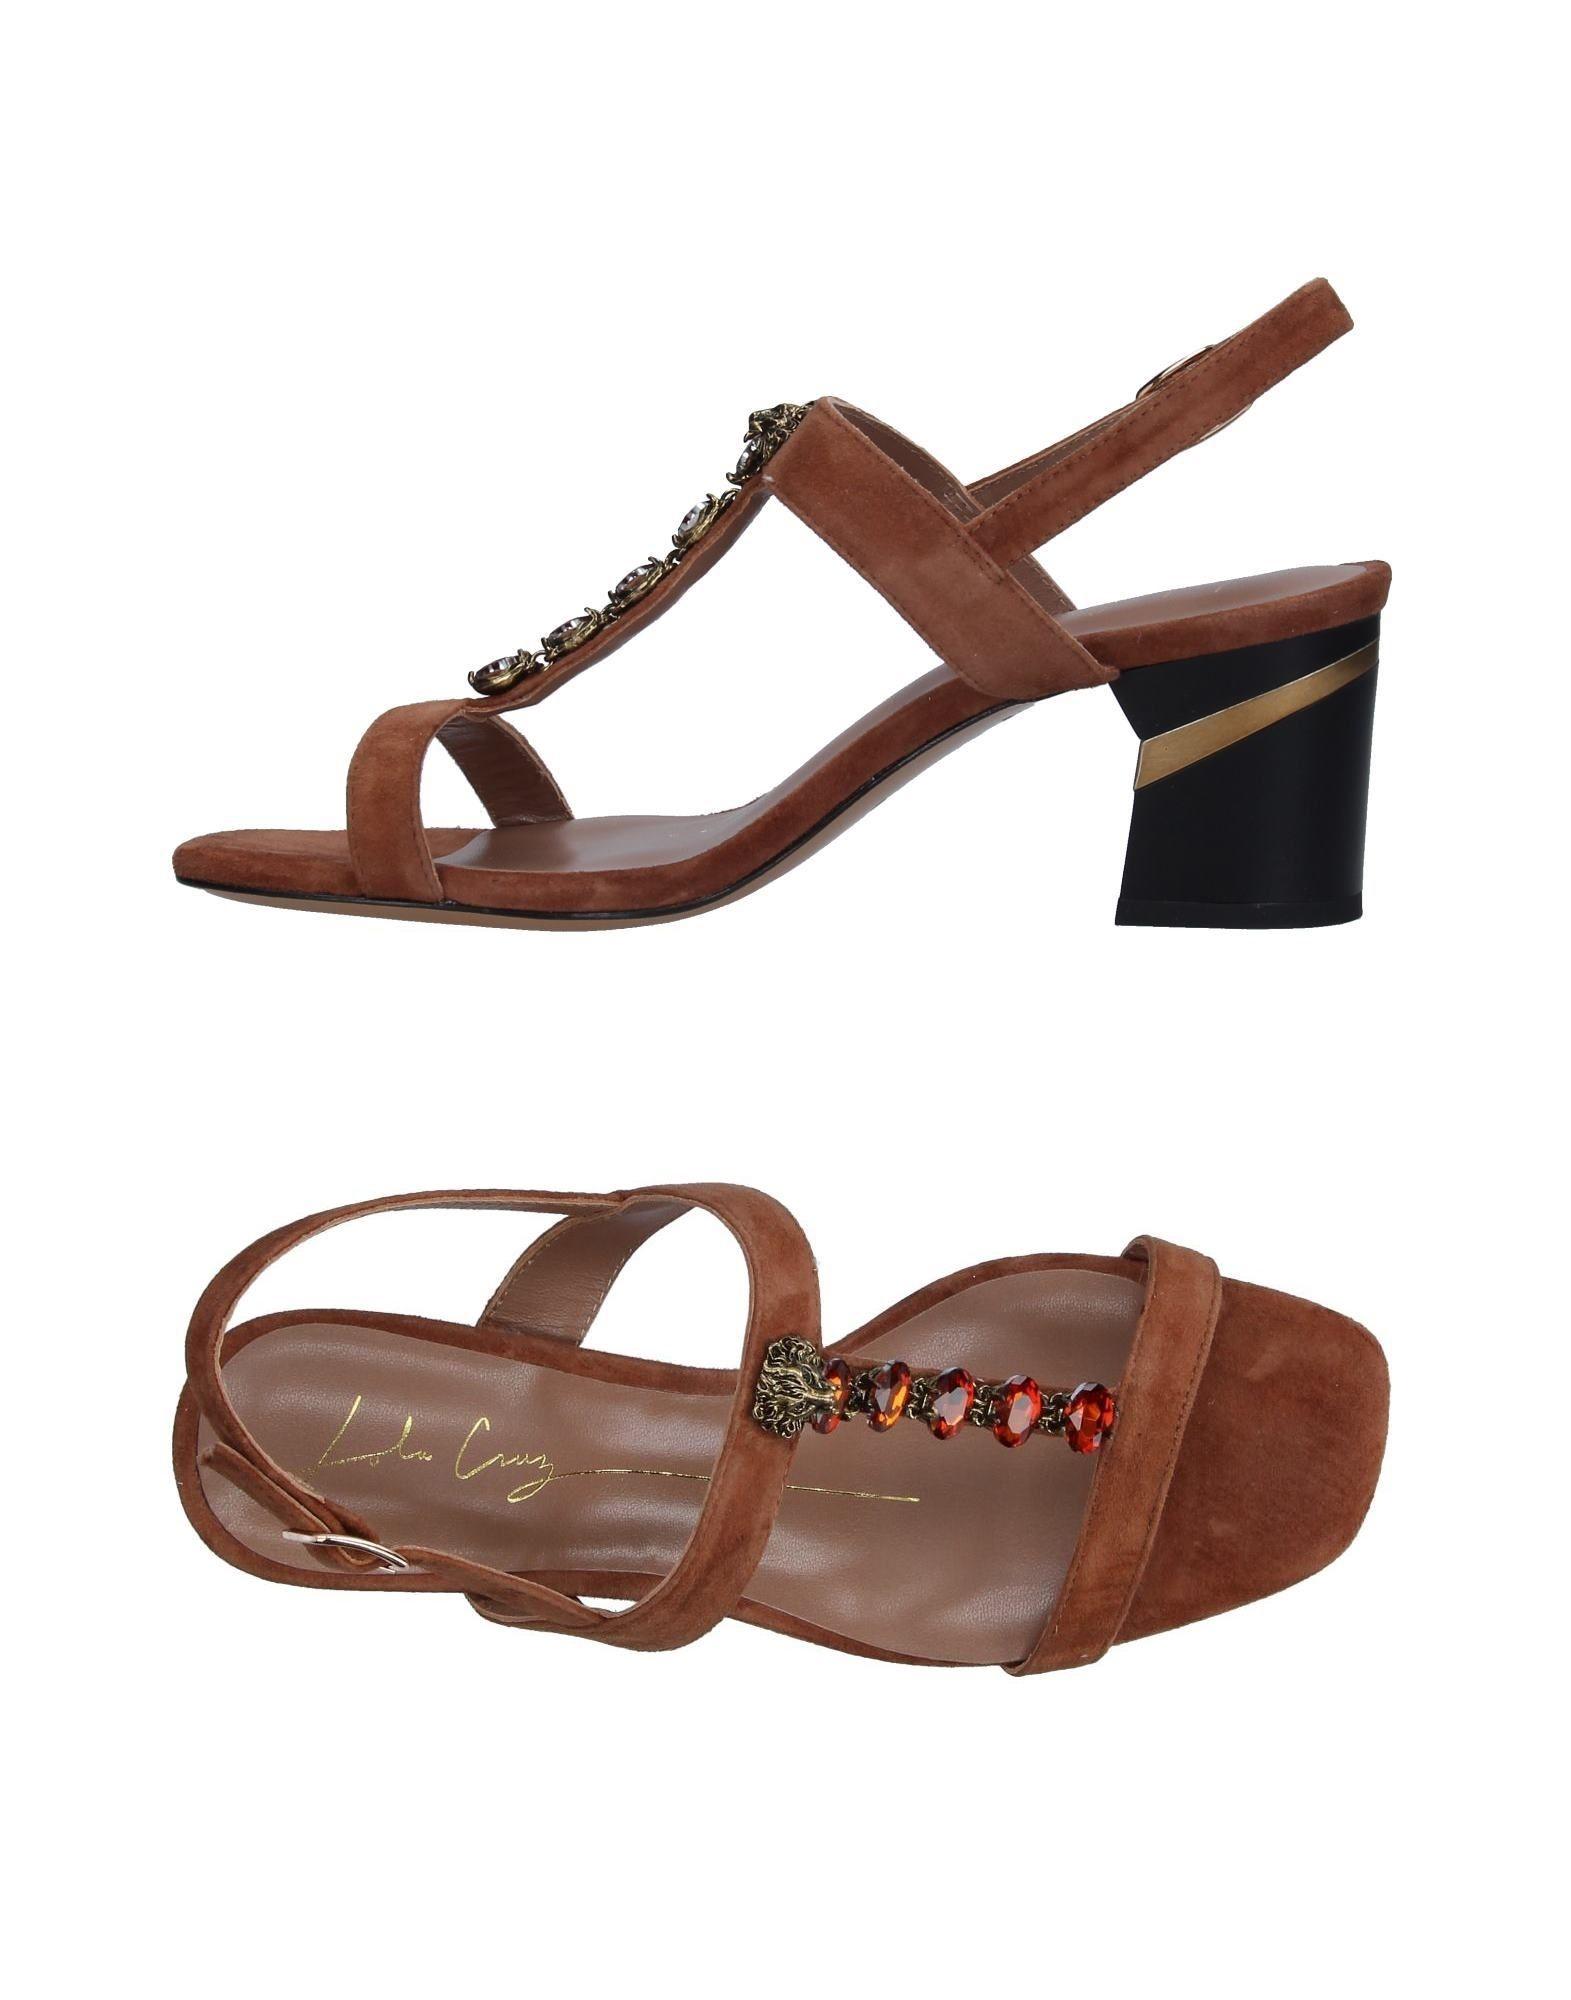 Lola Cruz Sandalen Damen  11349286BQ Gute Qualität beliebte Schuhe